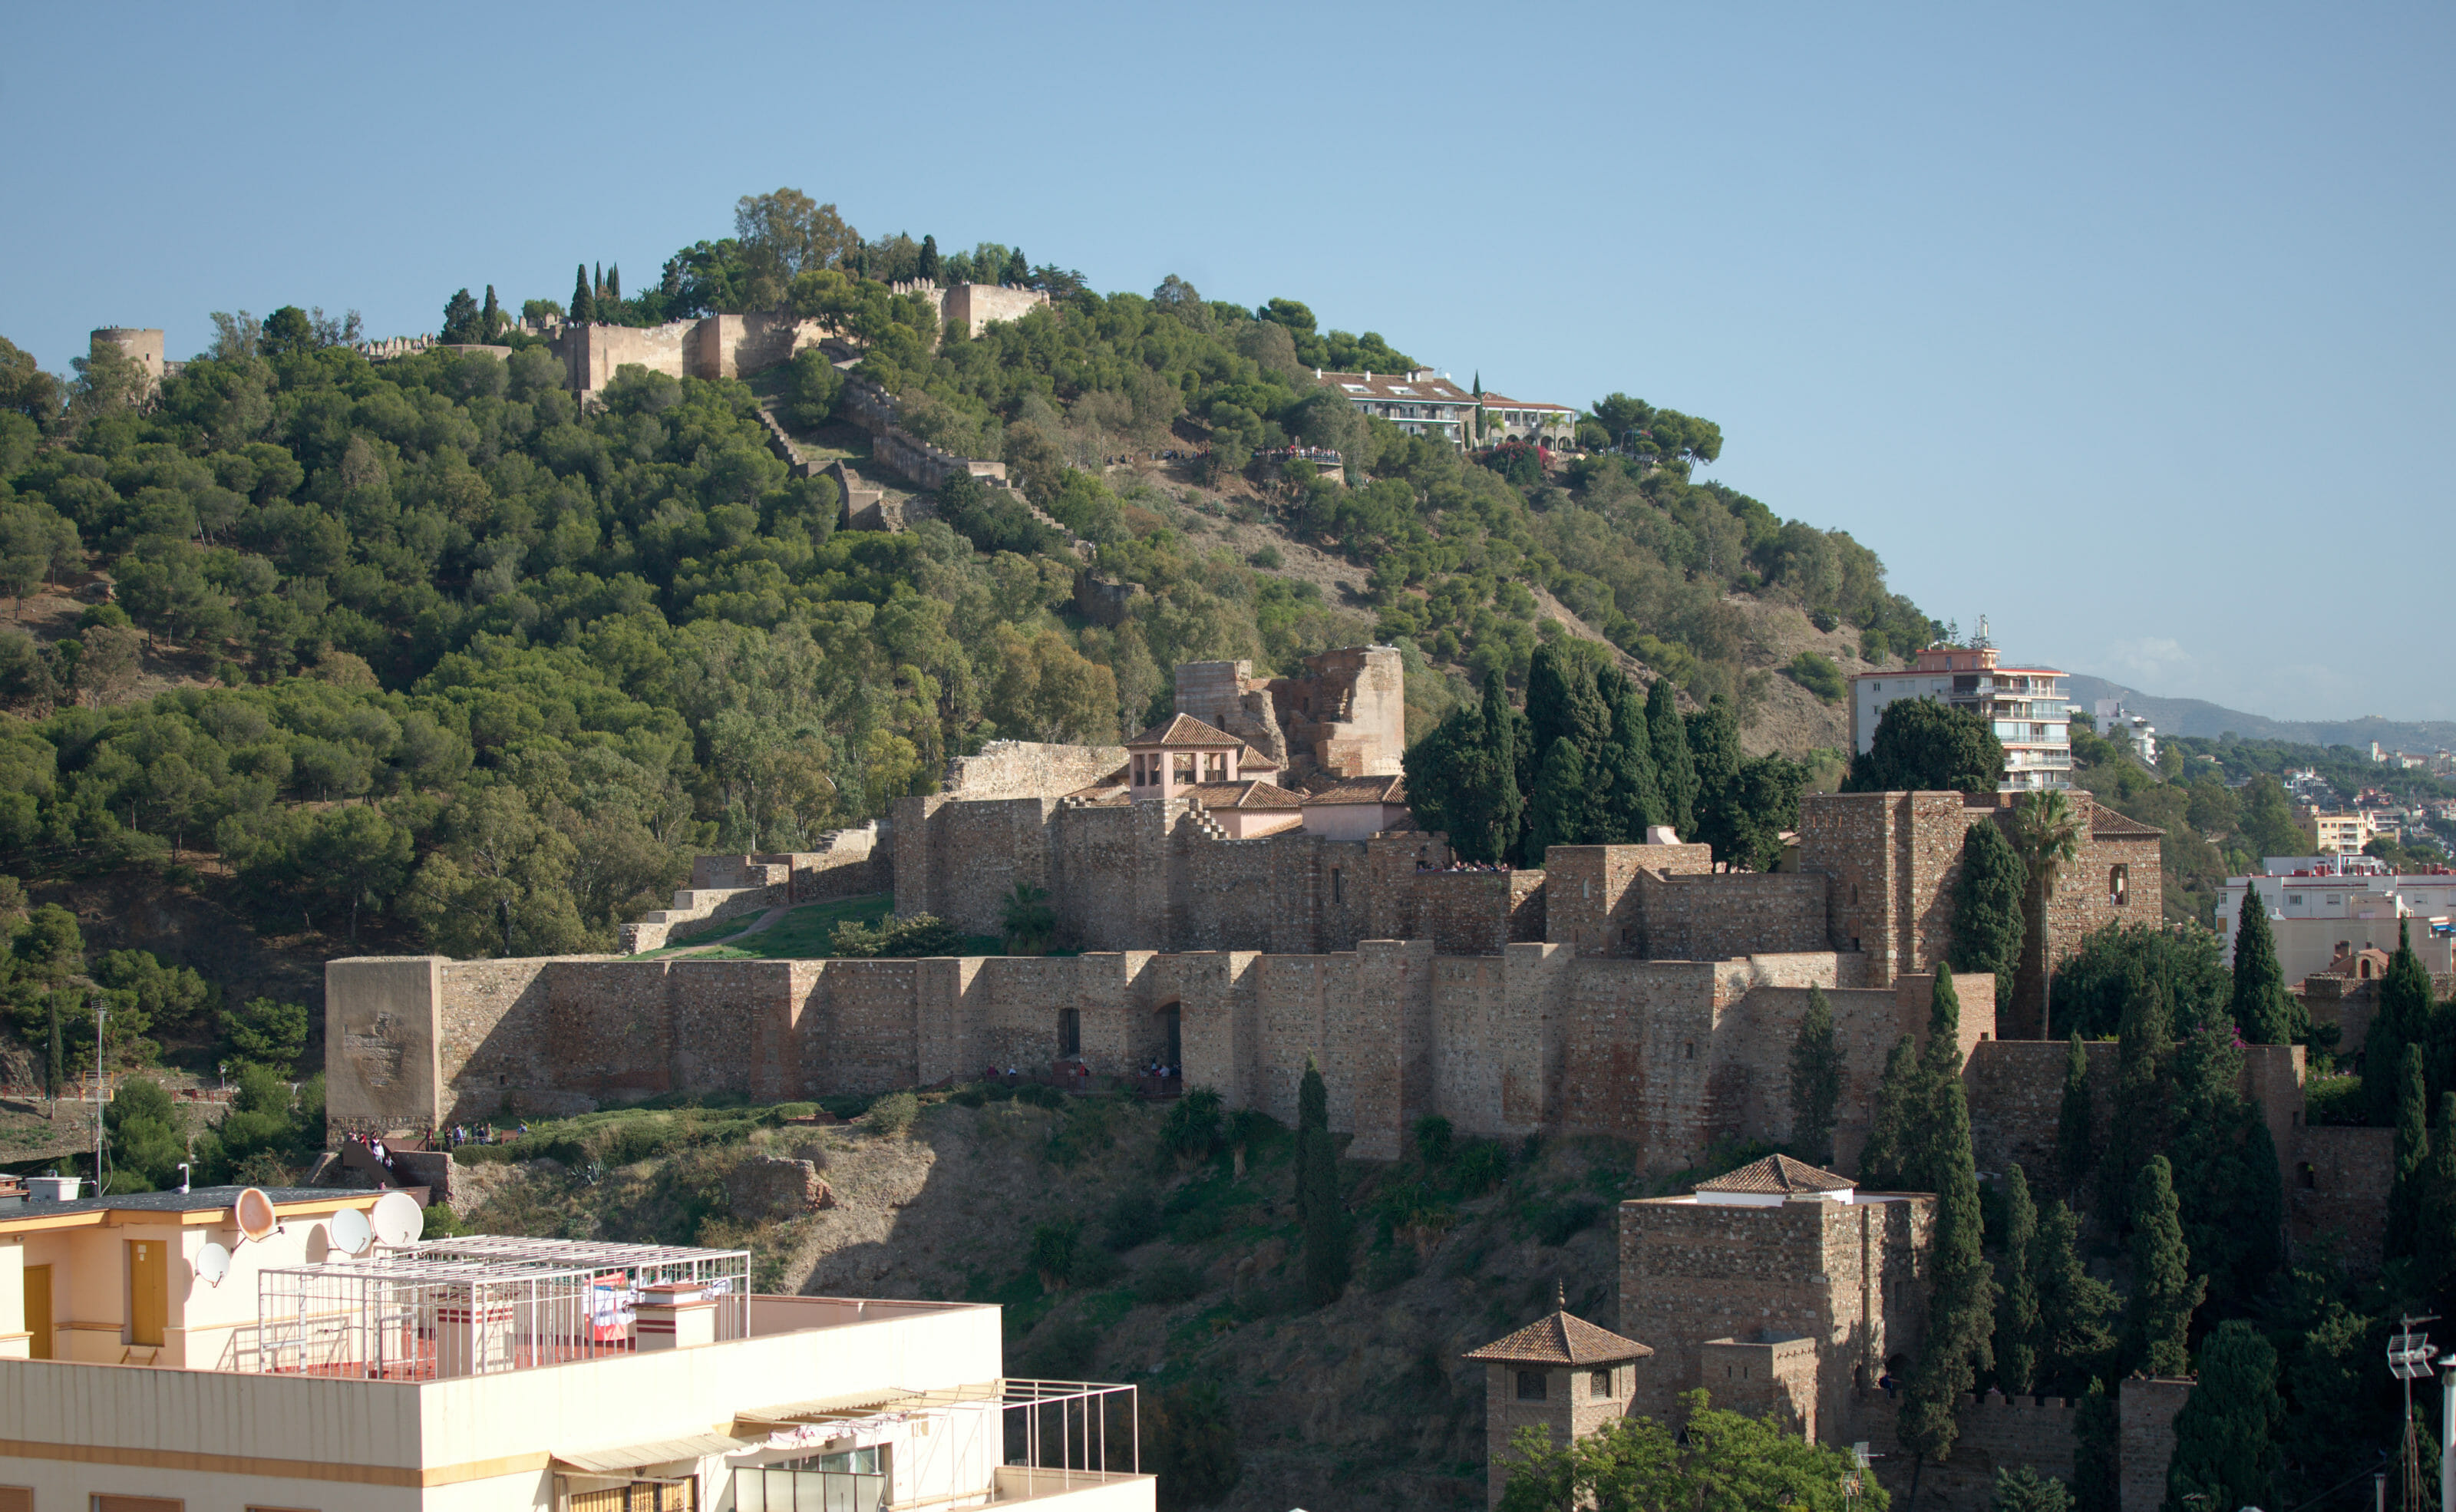 la citadelle Alcazaba et le château Gibralfaro à Malaga